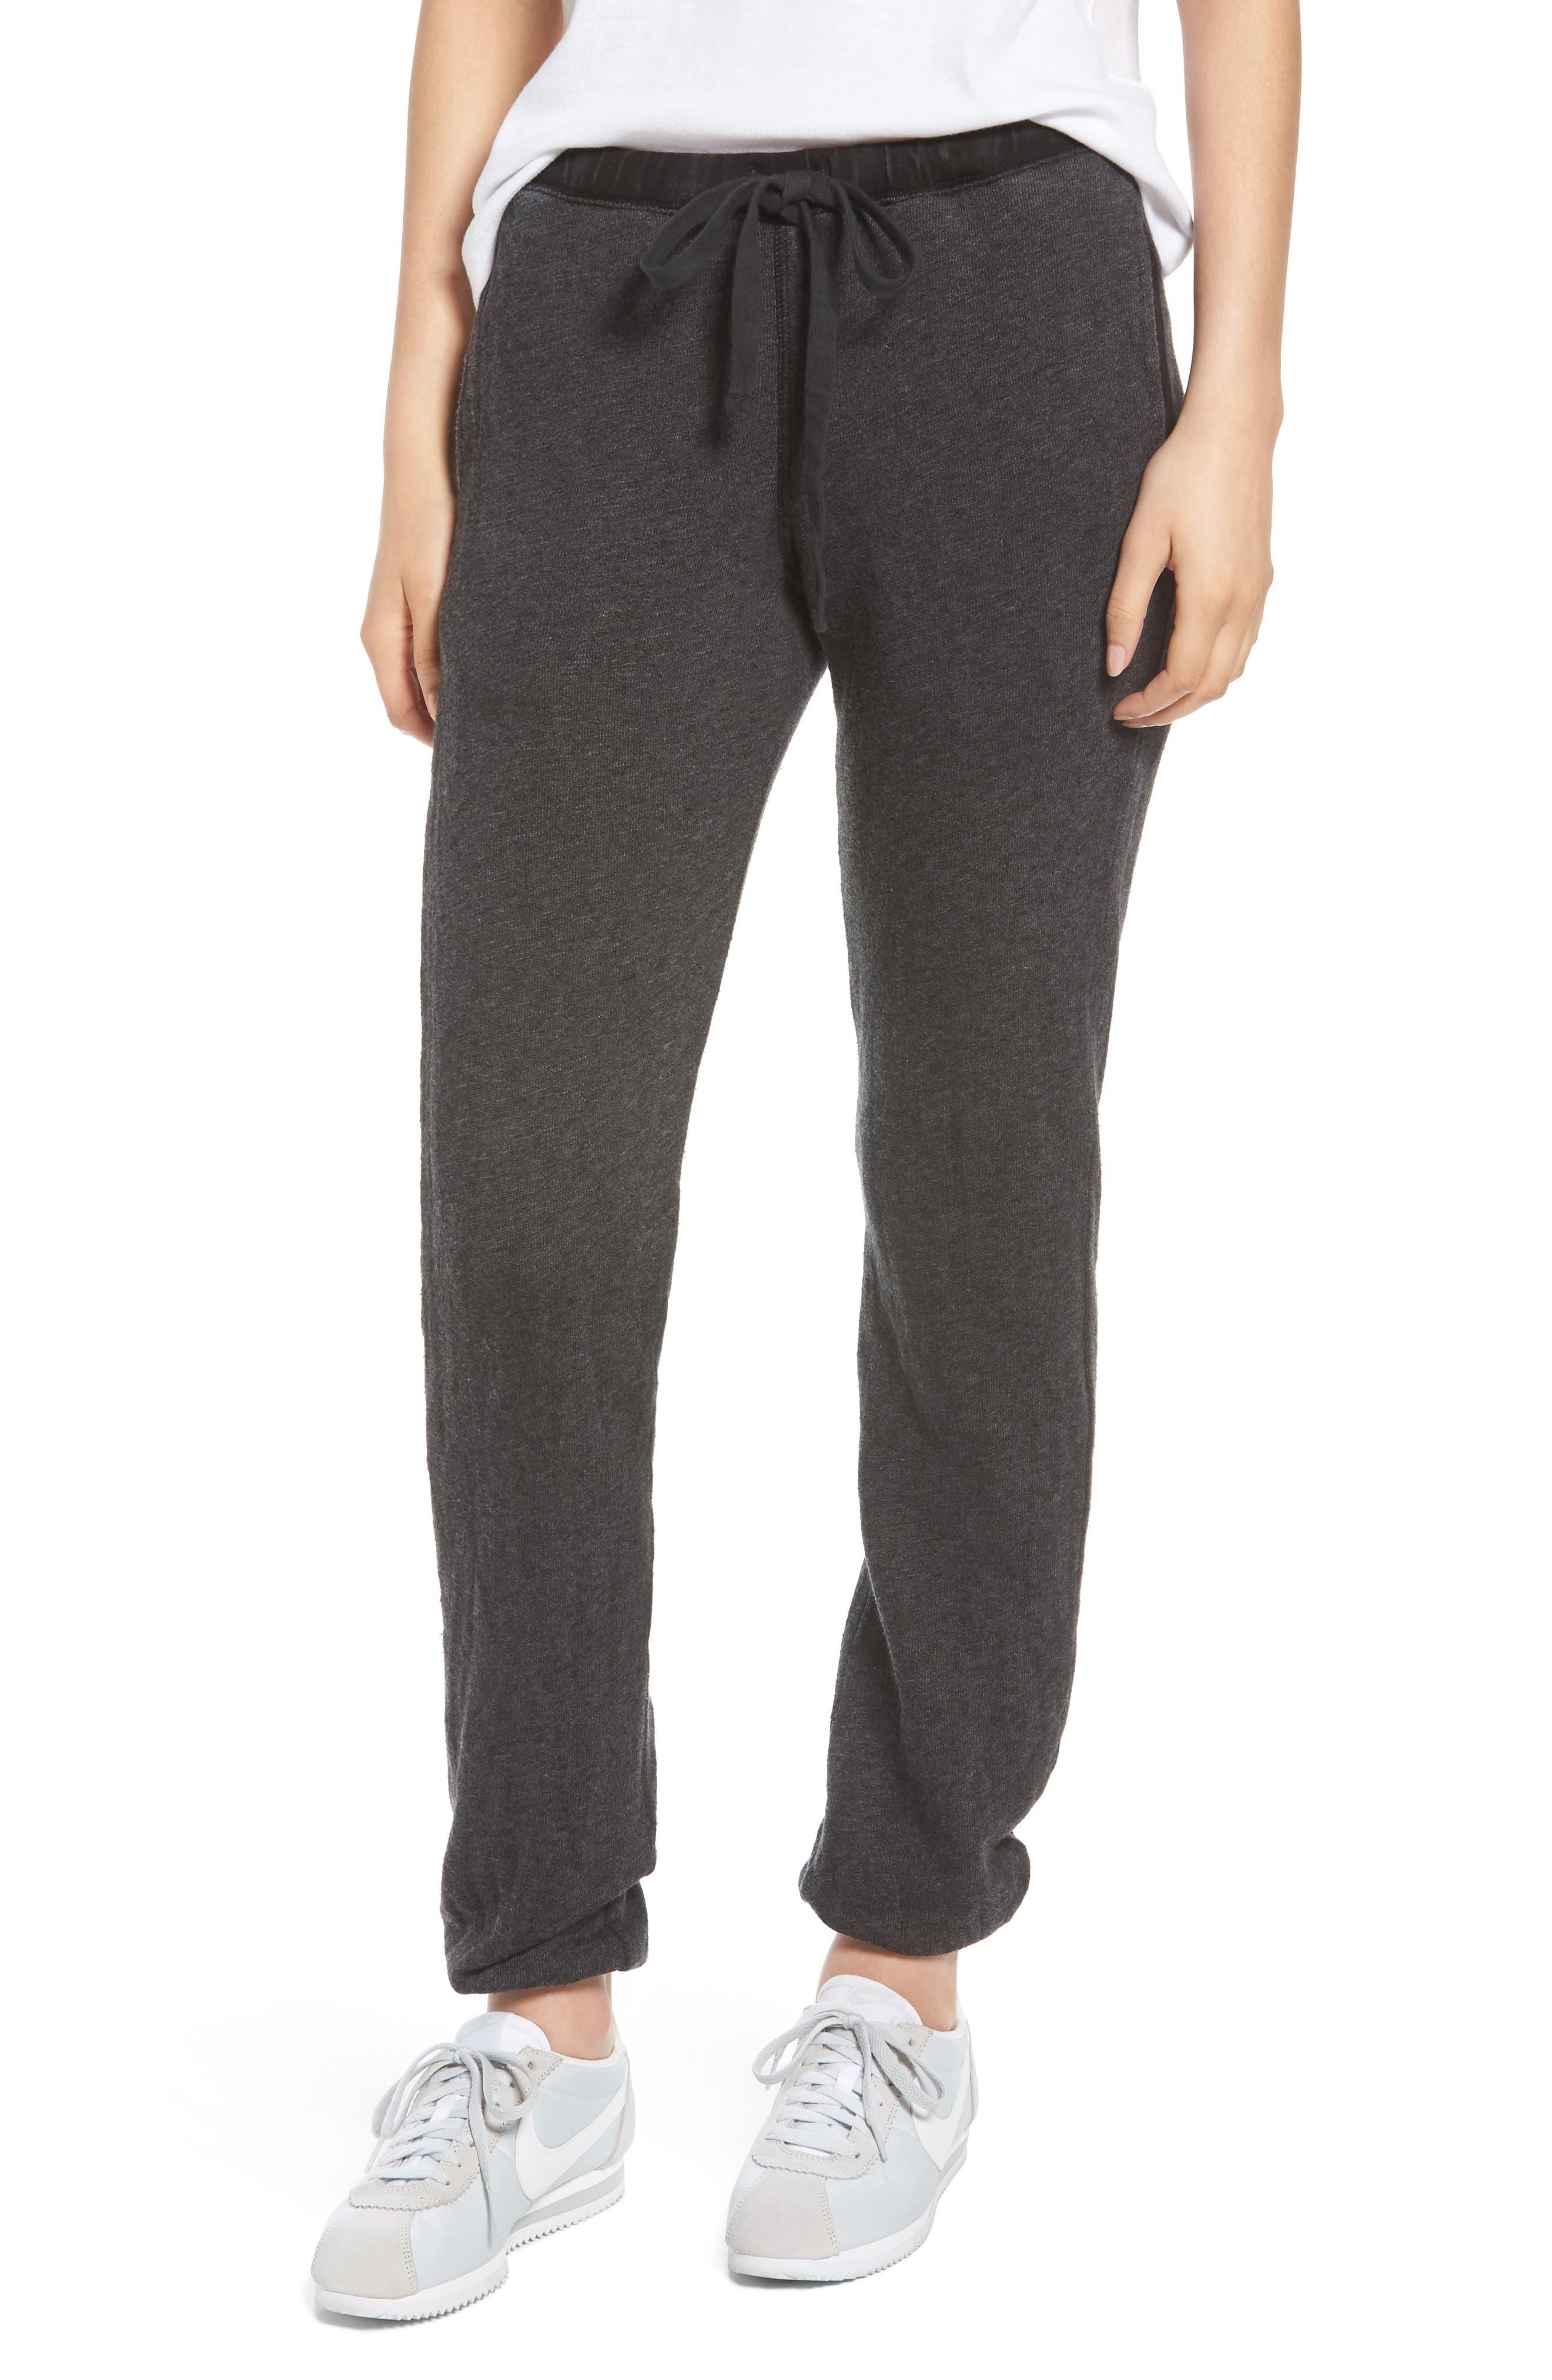 Kiama Lounge Pants,                         Main,                         color, Mw Black